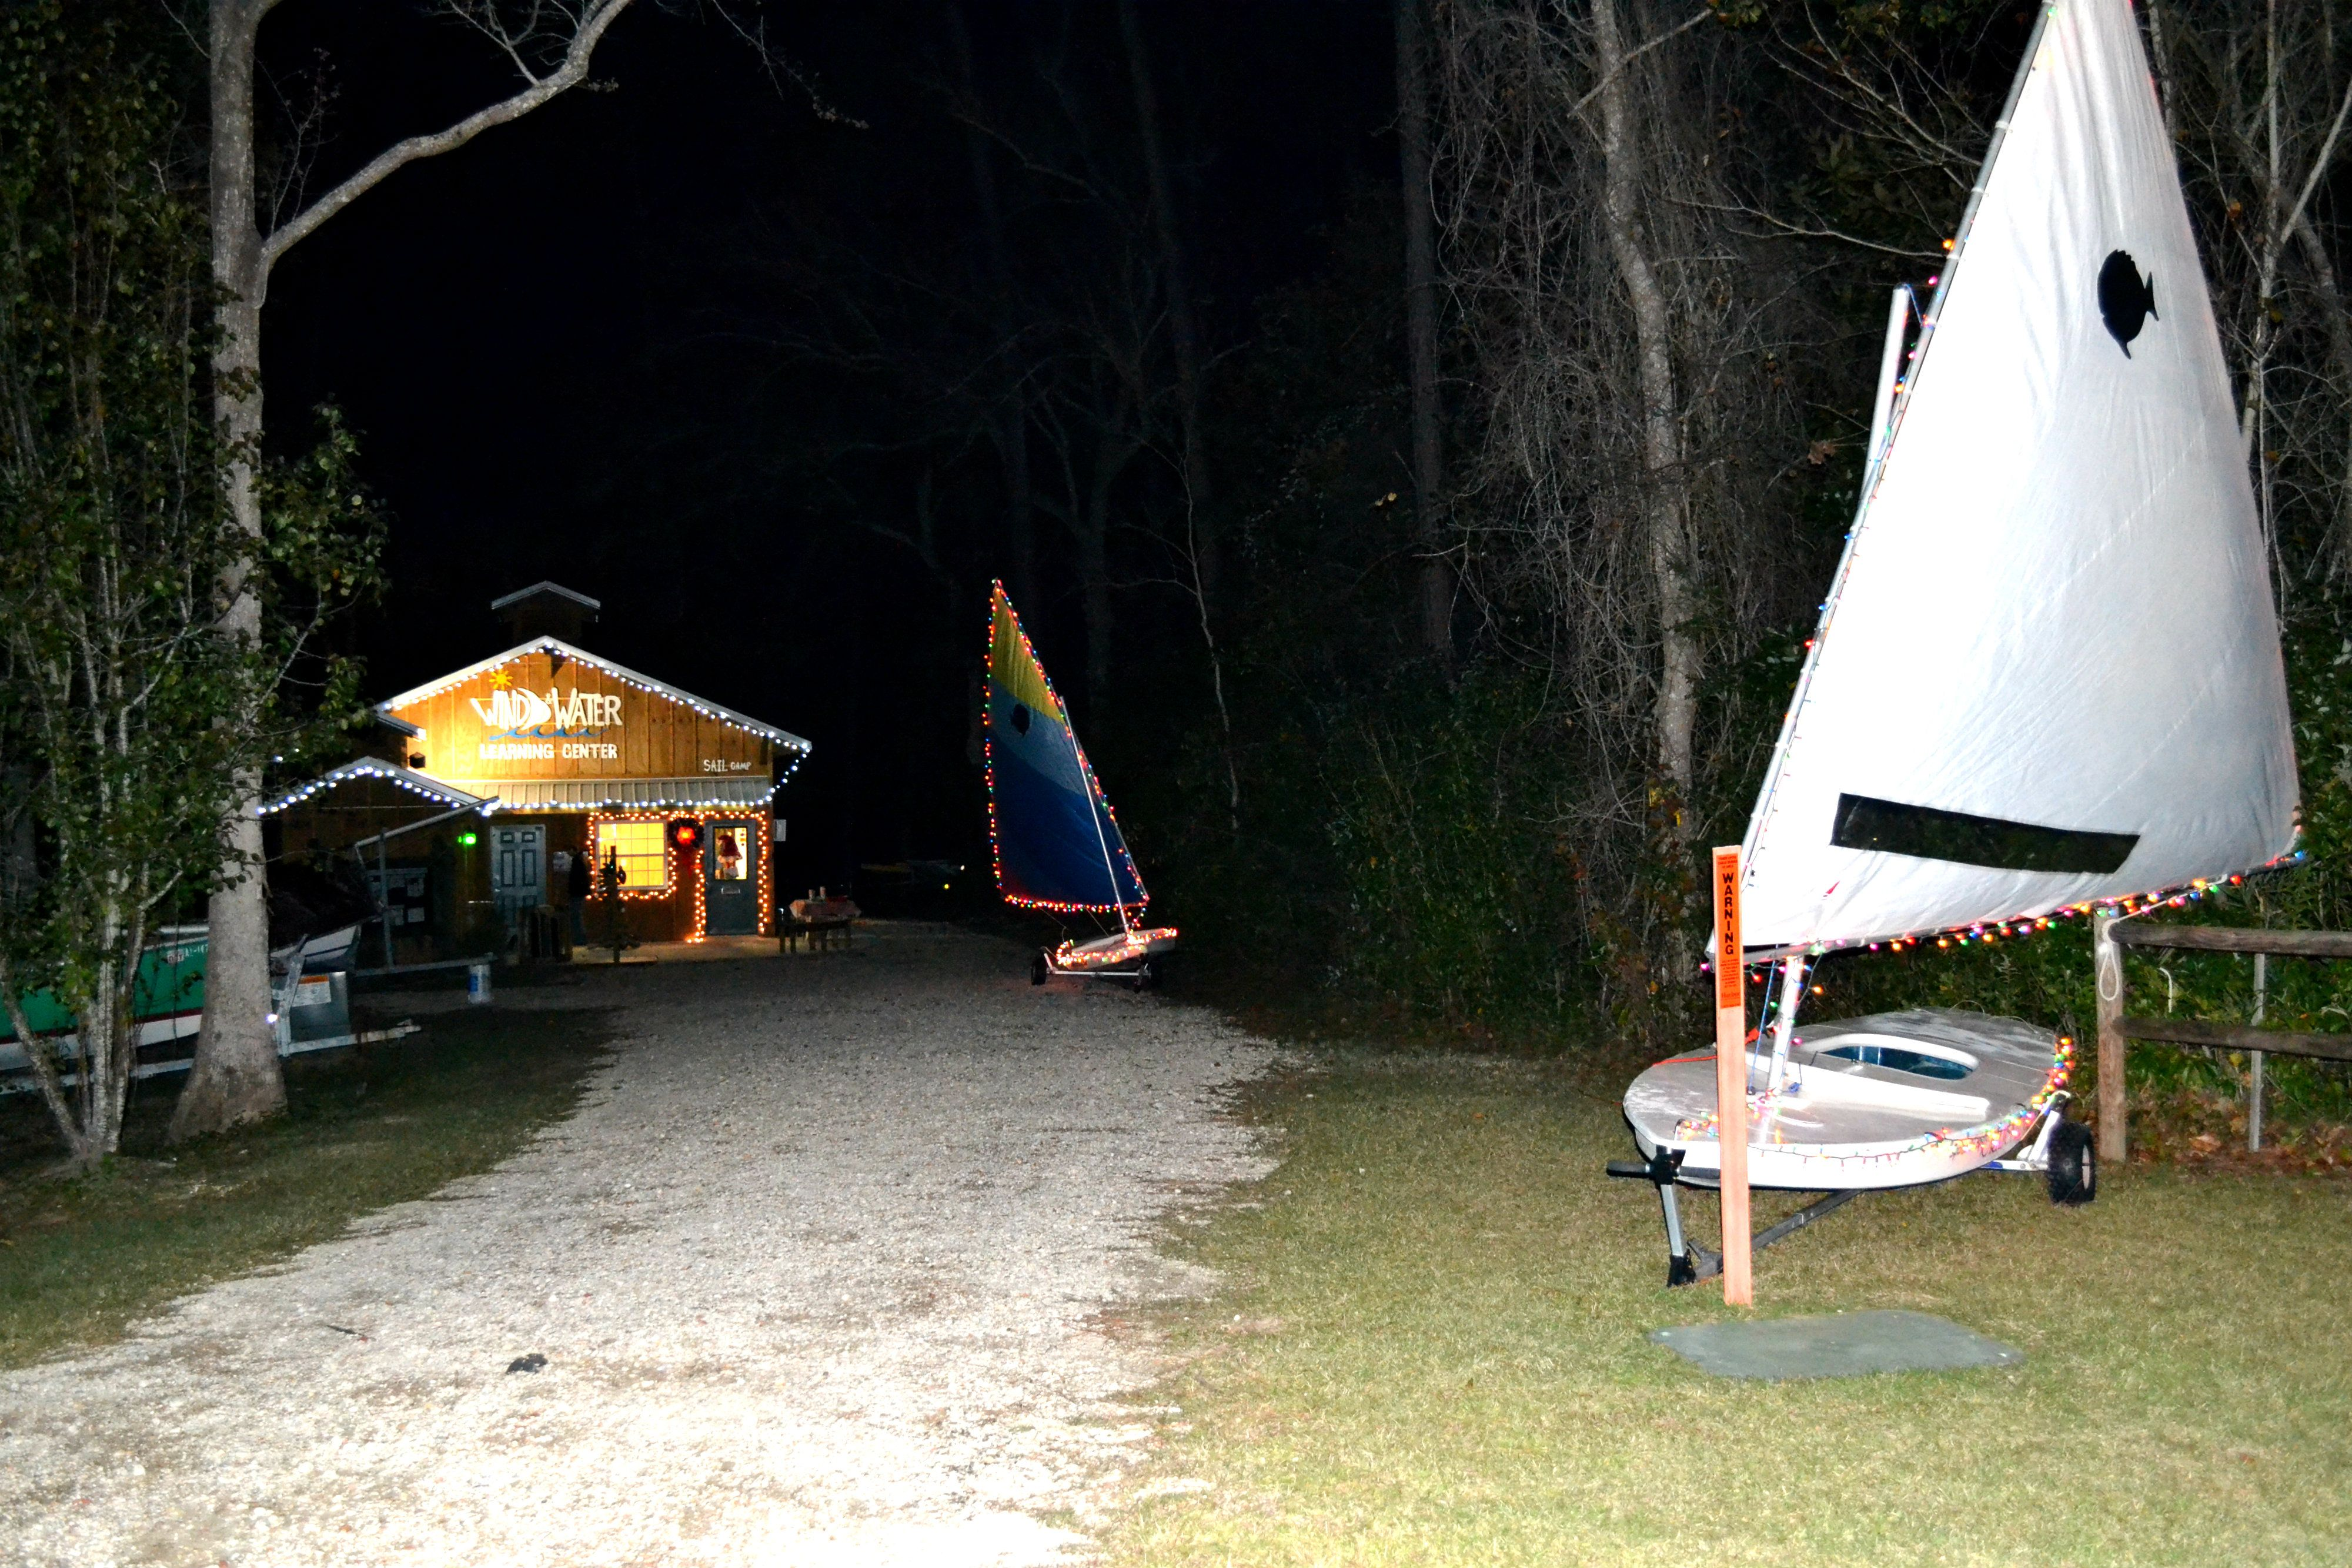 #WindandWaterLearningCenter lit up for the #CoastalChristmas Stroll 2013 #Christmas in #OrangeBeach